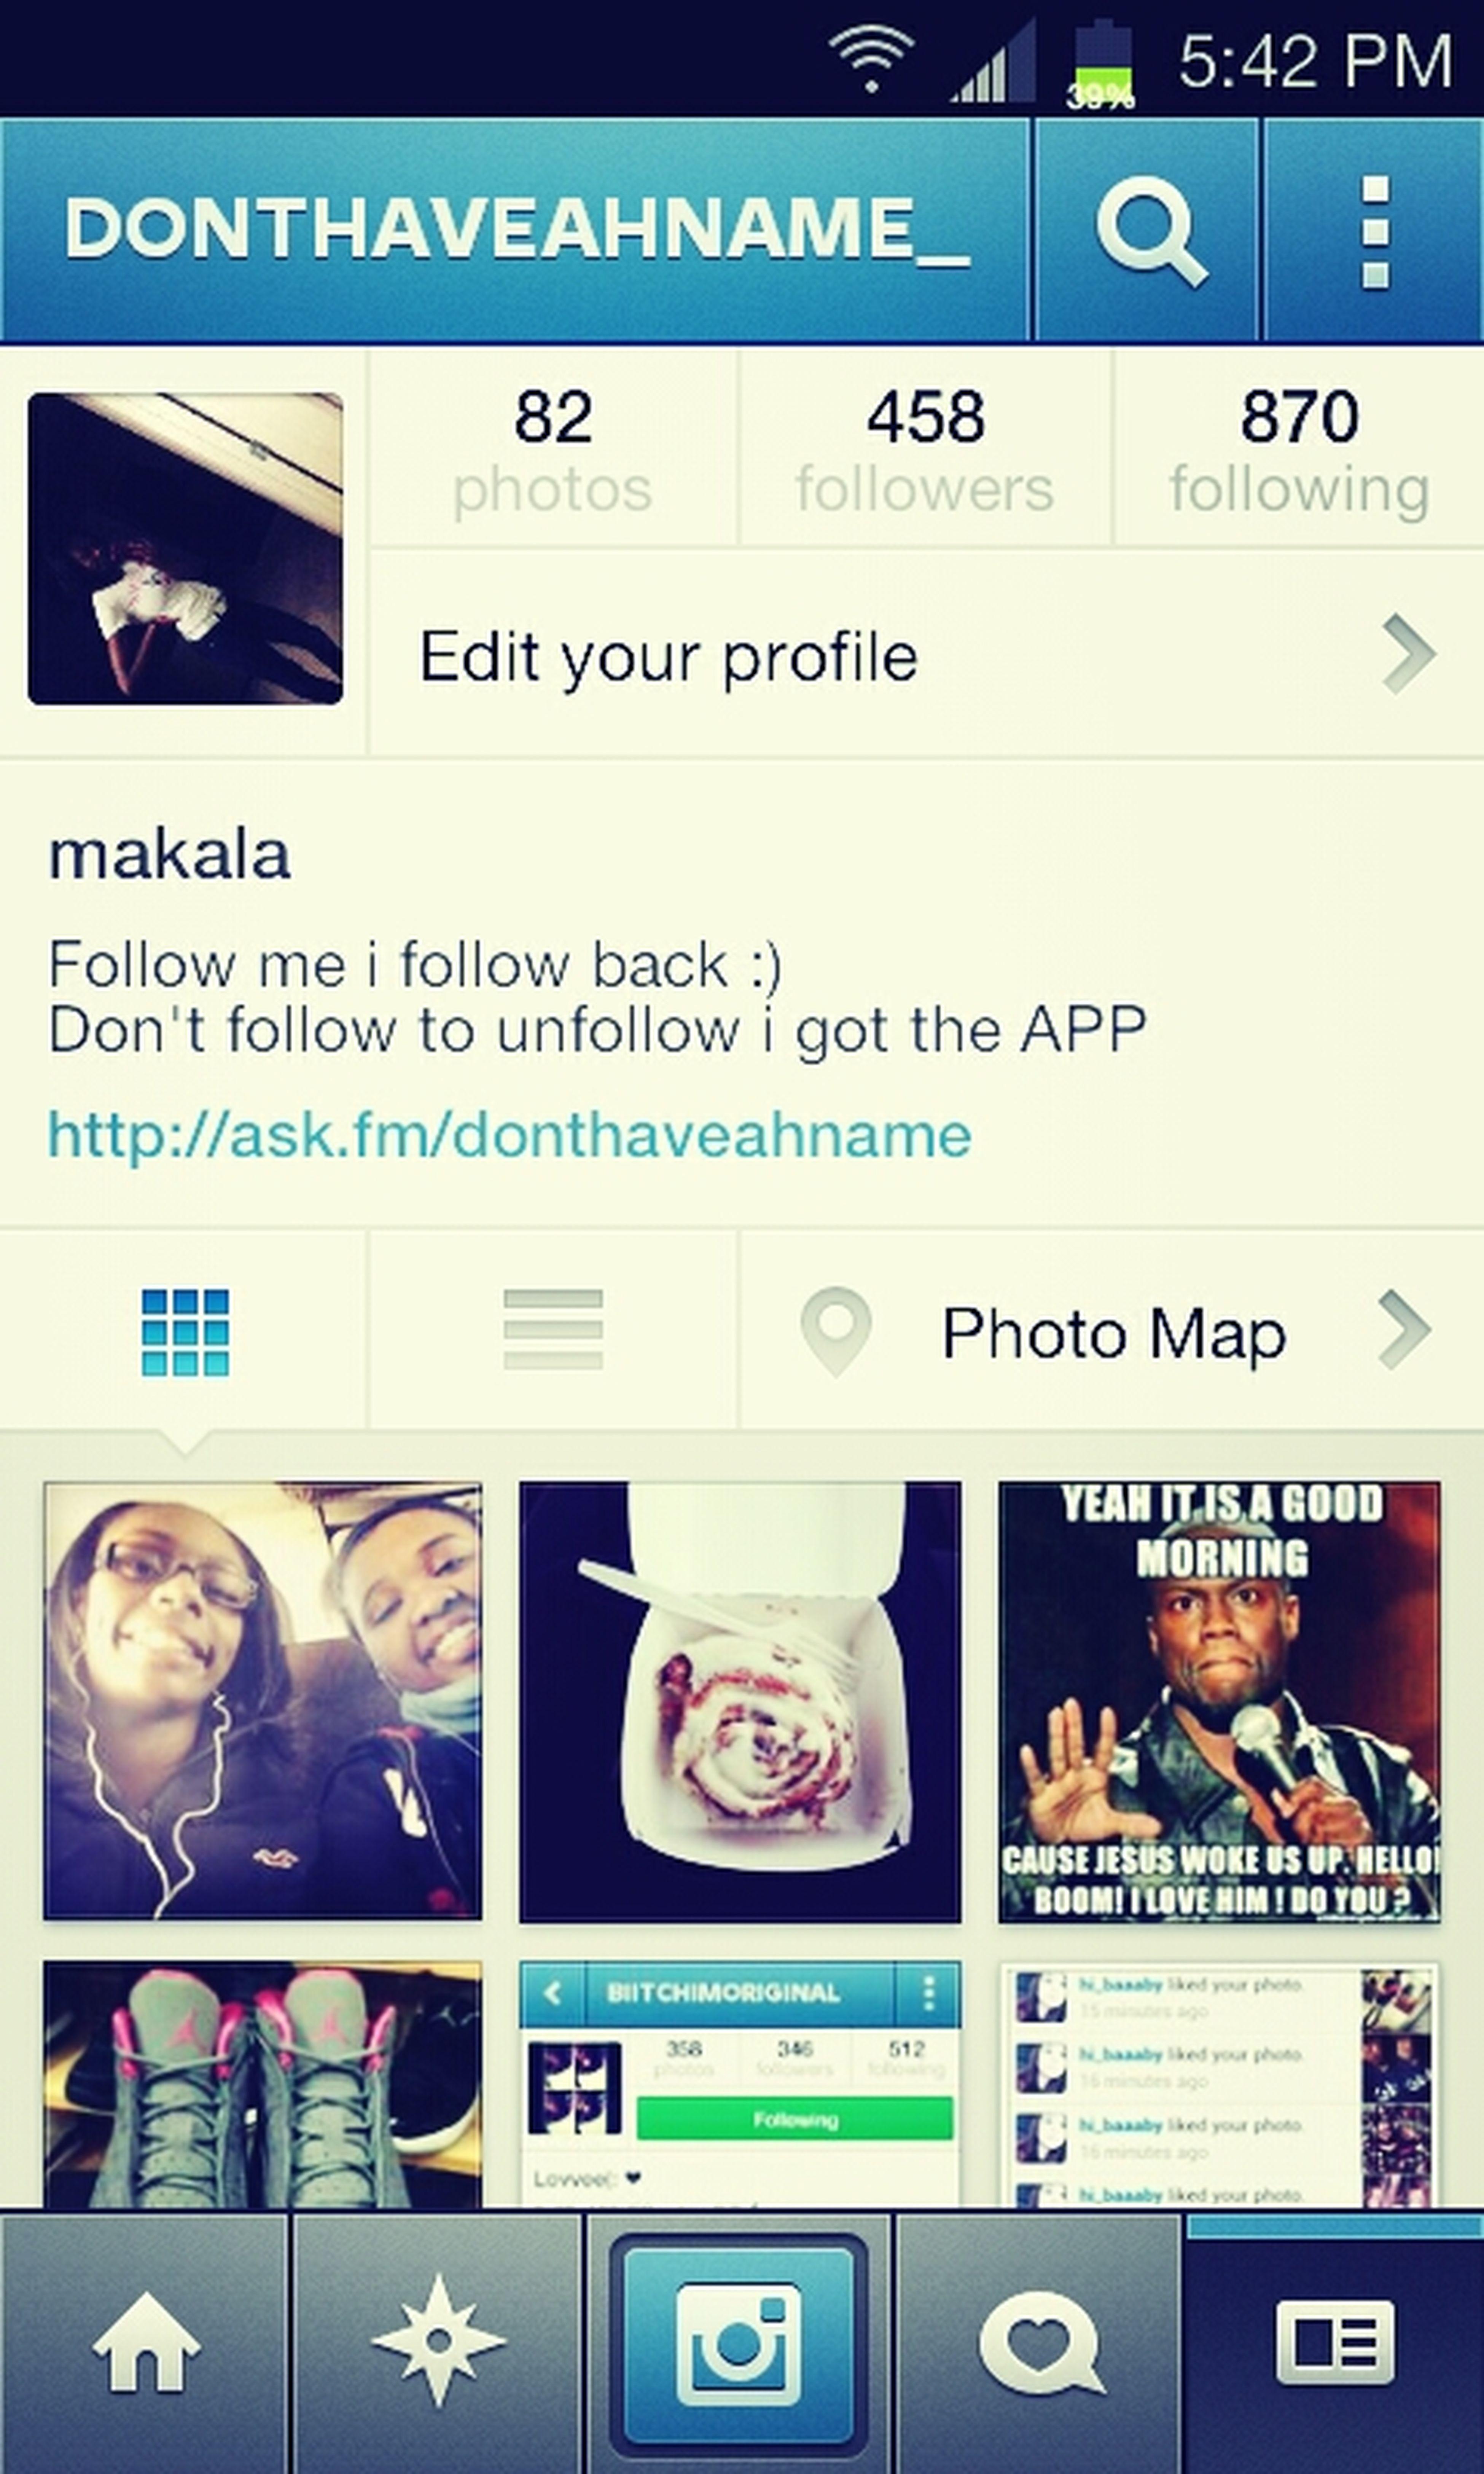 follow me on instagram @donthaveahname (2 underscores)